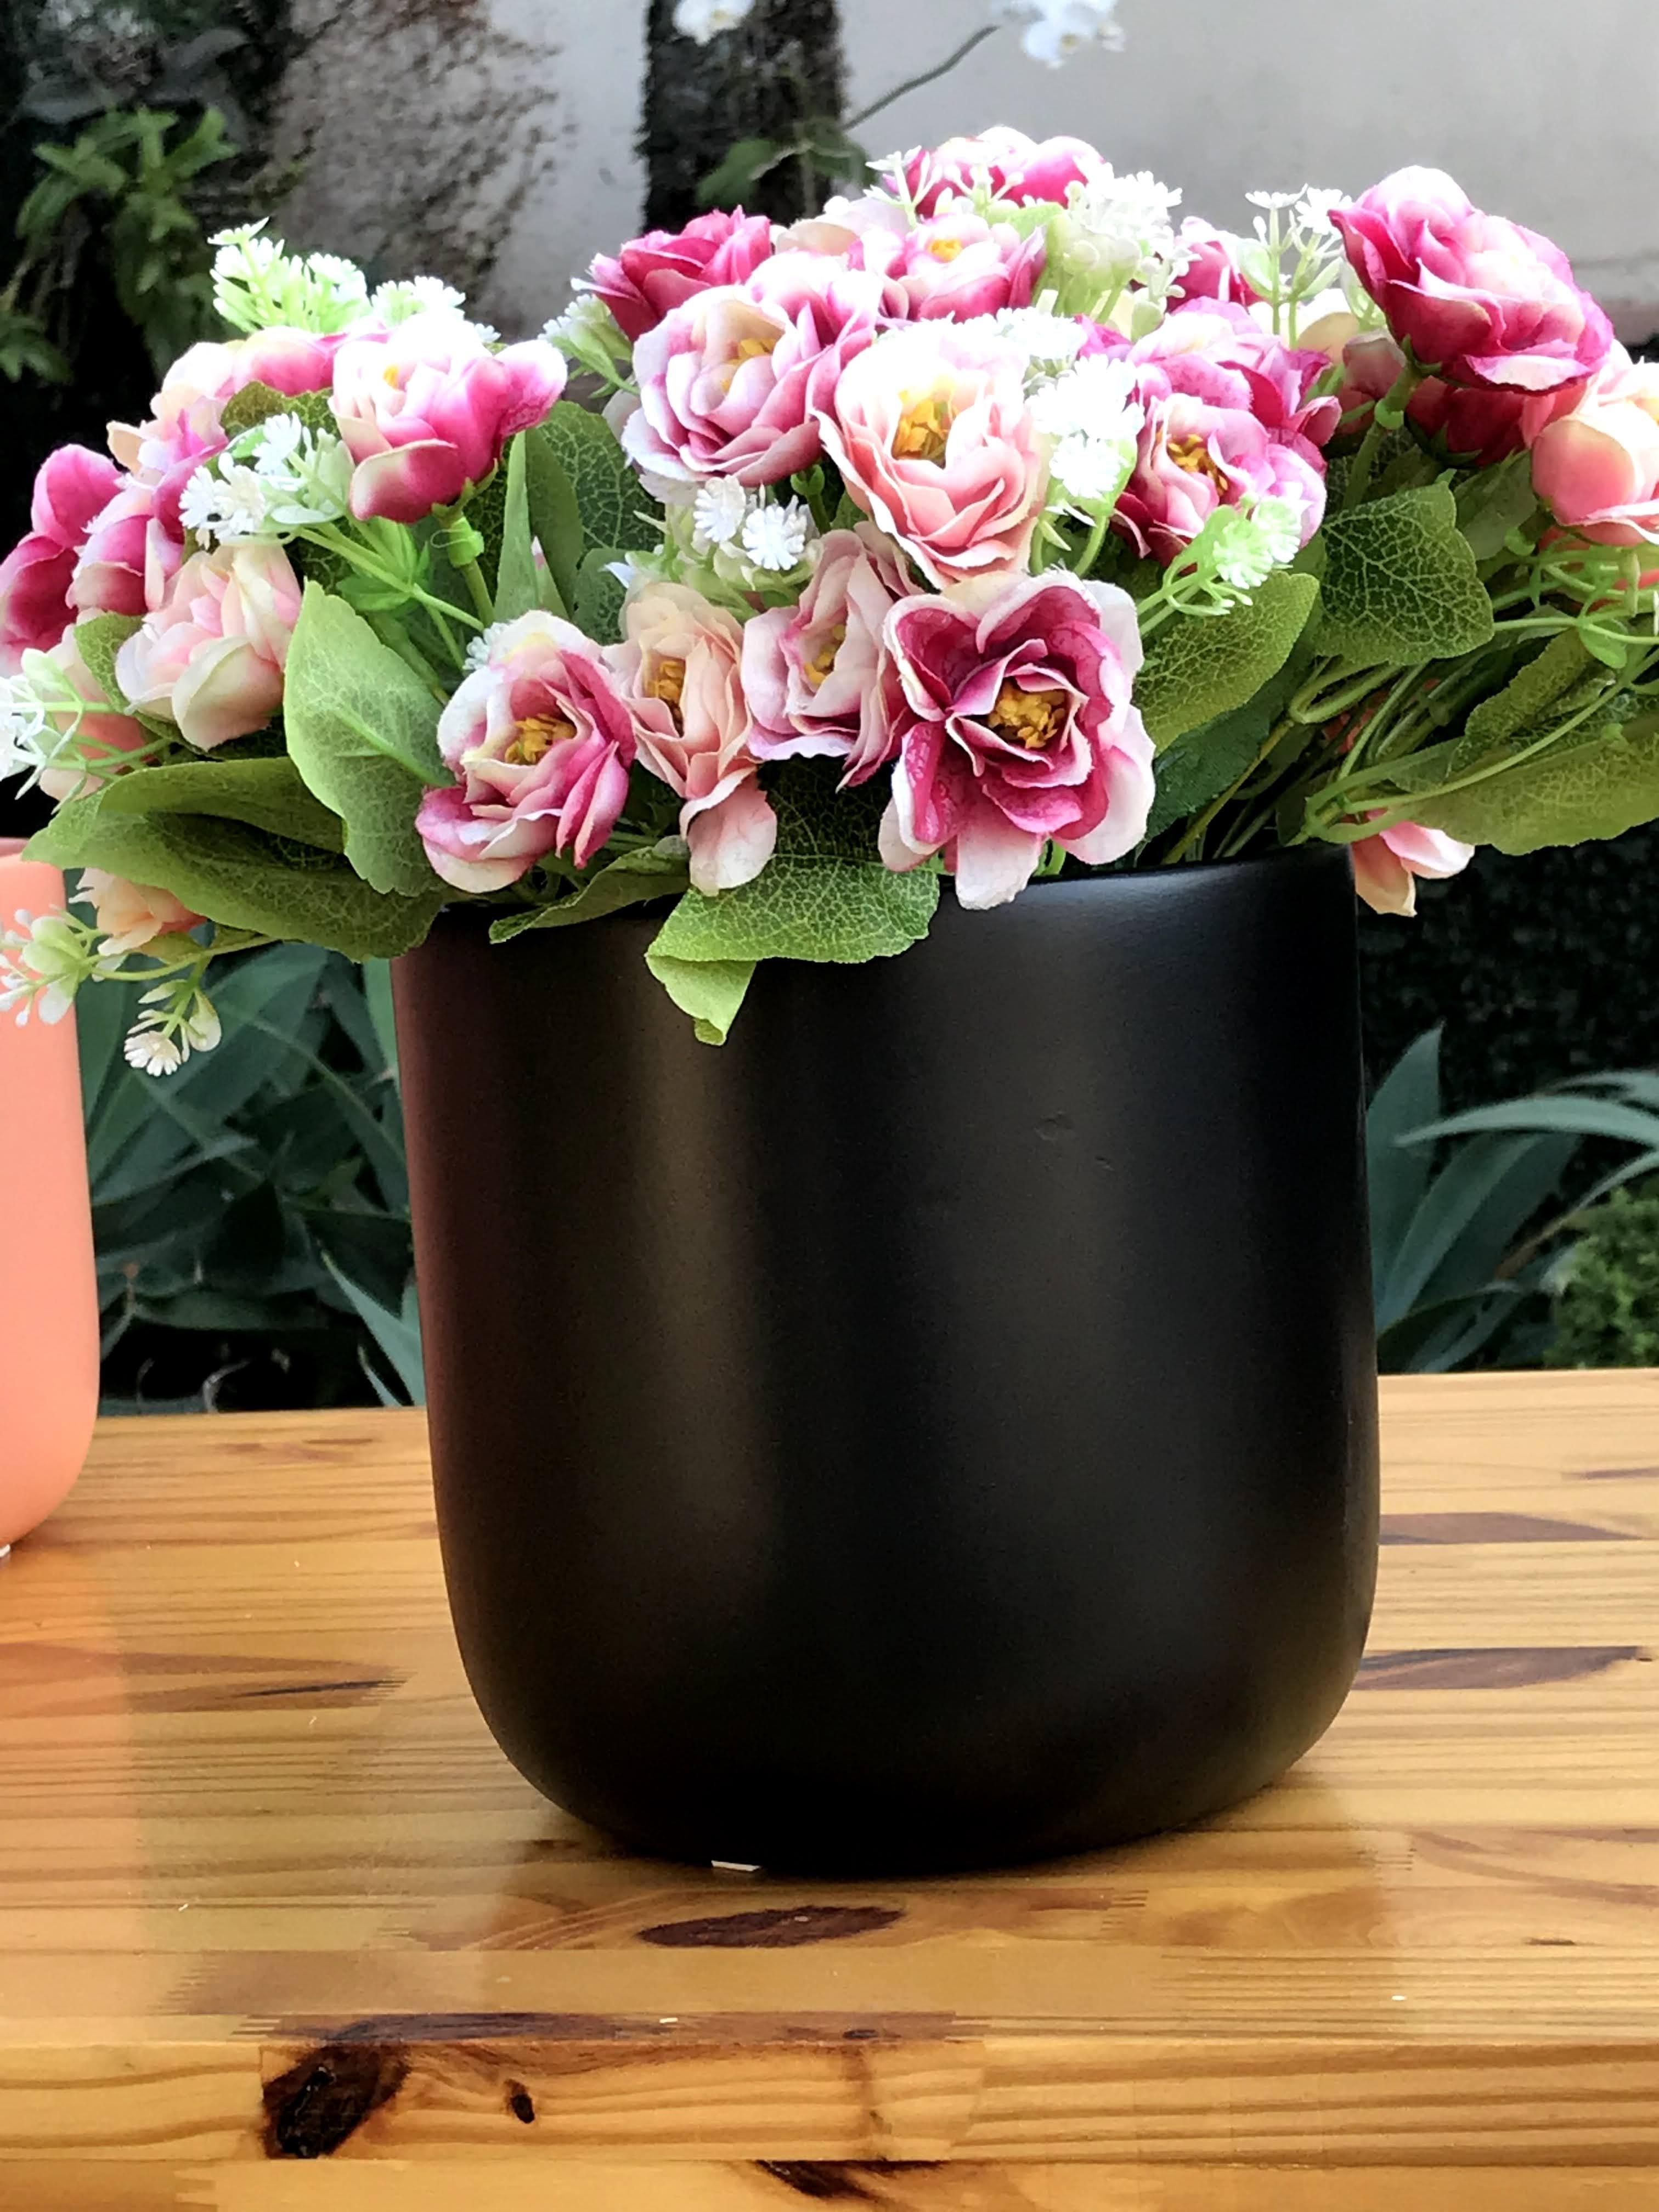 Cachepot para arranjos de orquídeas - Cerâmica Burguina